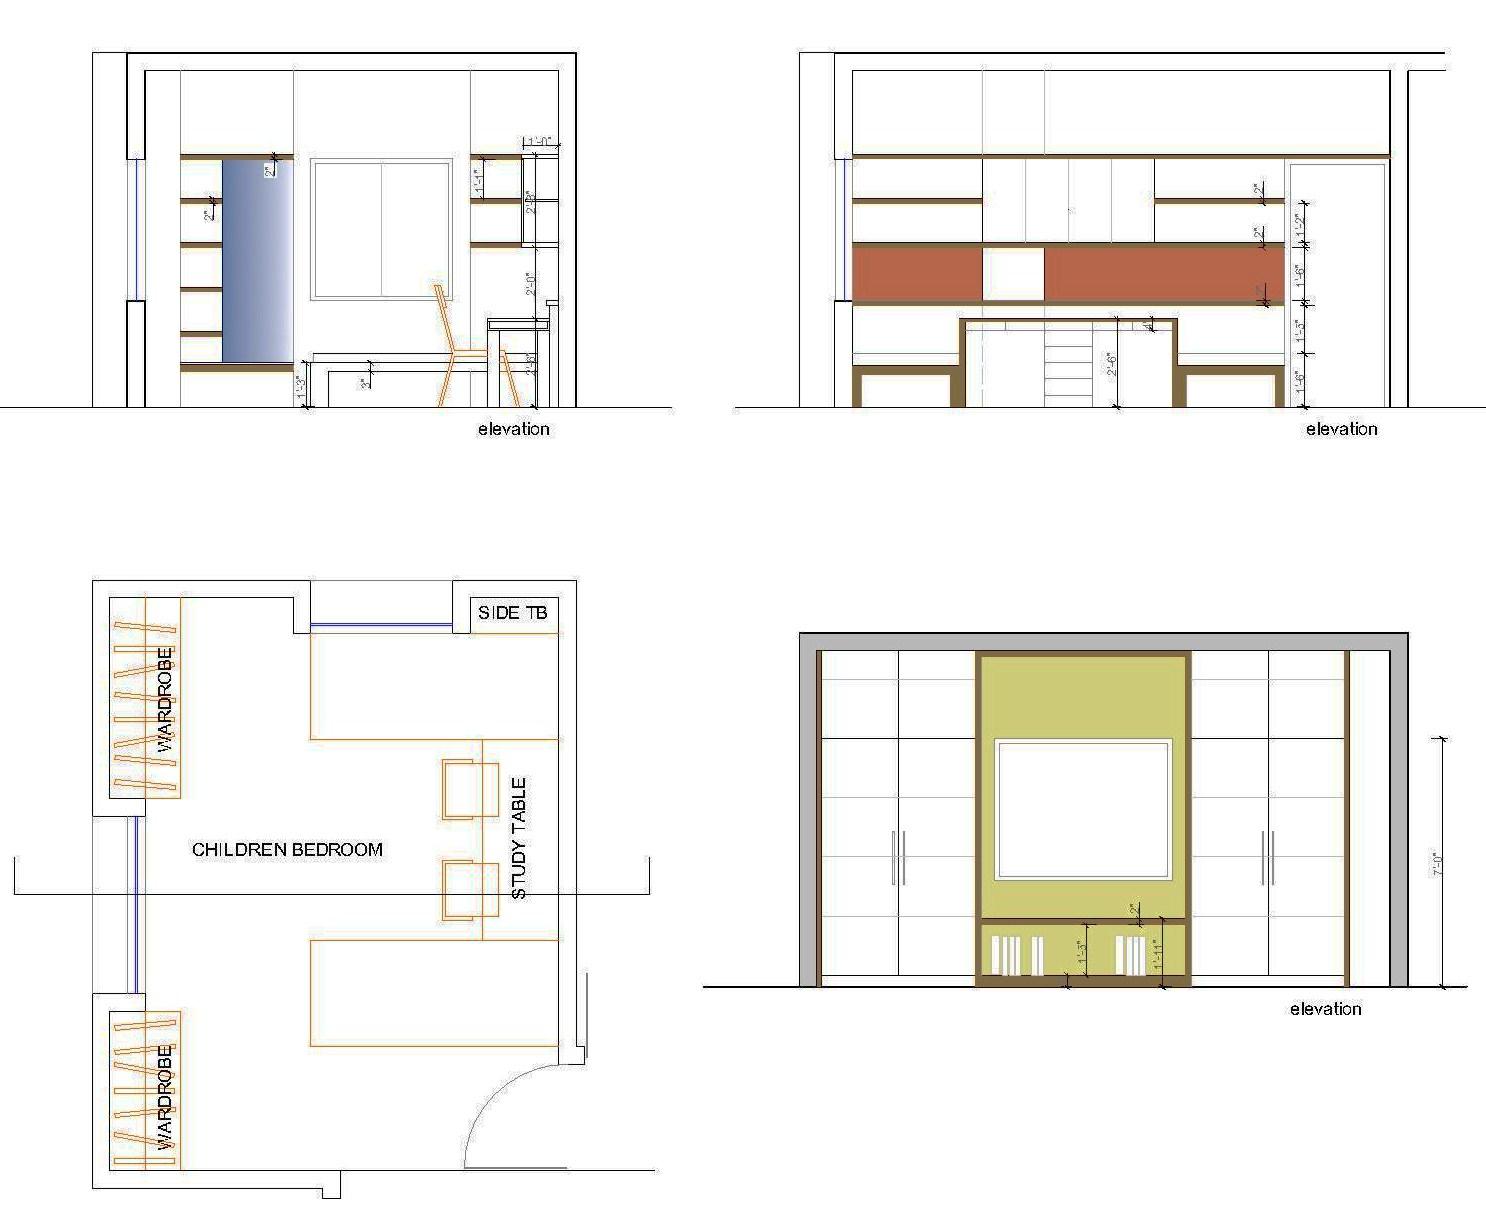 Front Elevation Mirror : Interior designing portfolio renovation of a bedroom